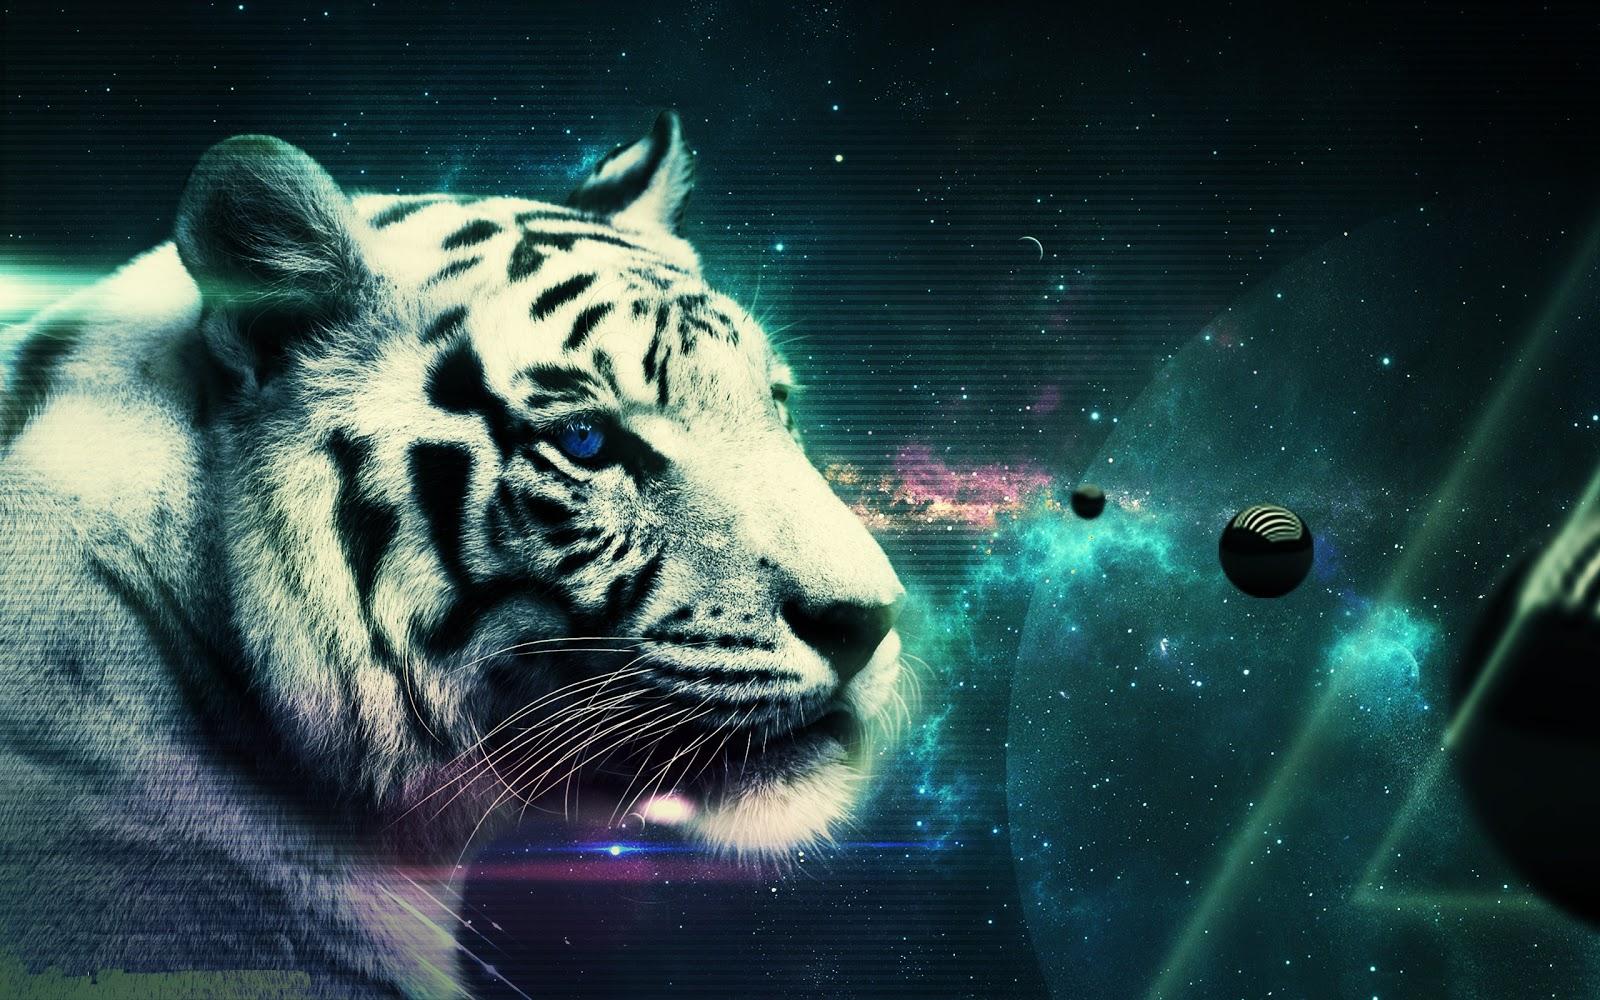 white tigerbeautiful tigerhd tiger imagessleeping tiger high 1600x1000